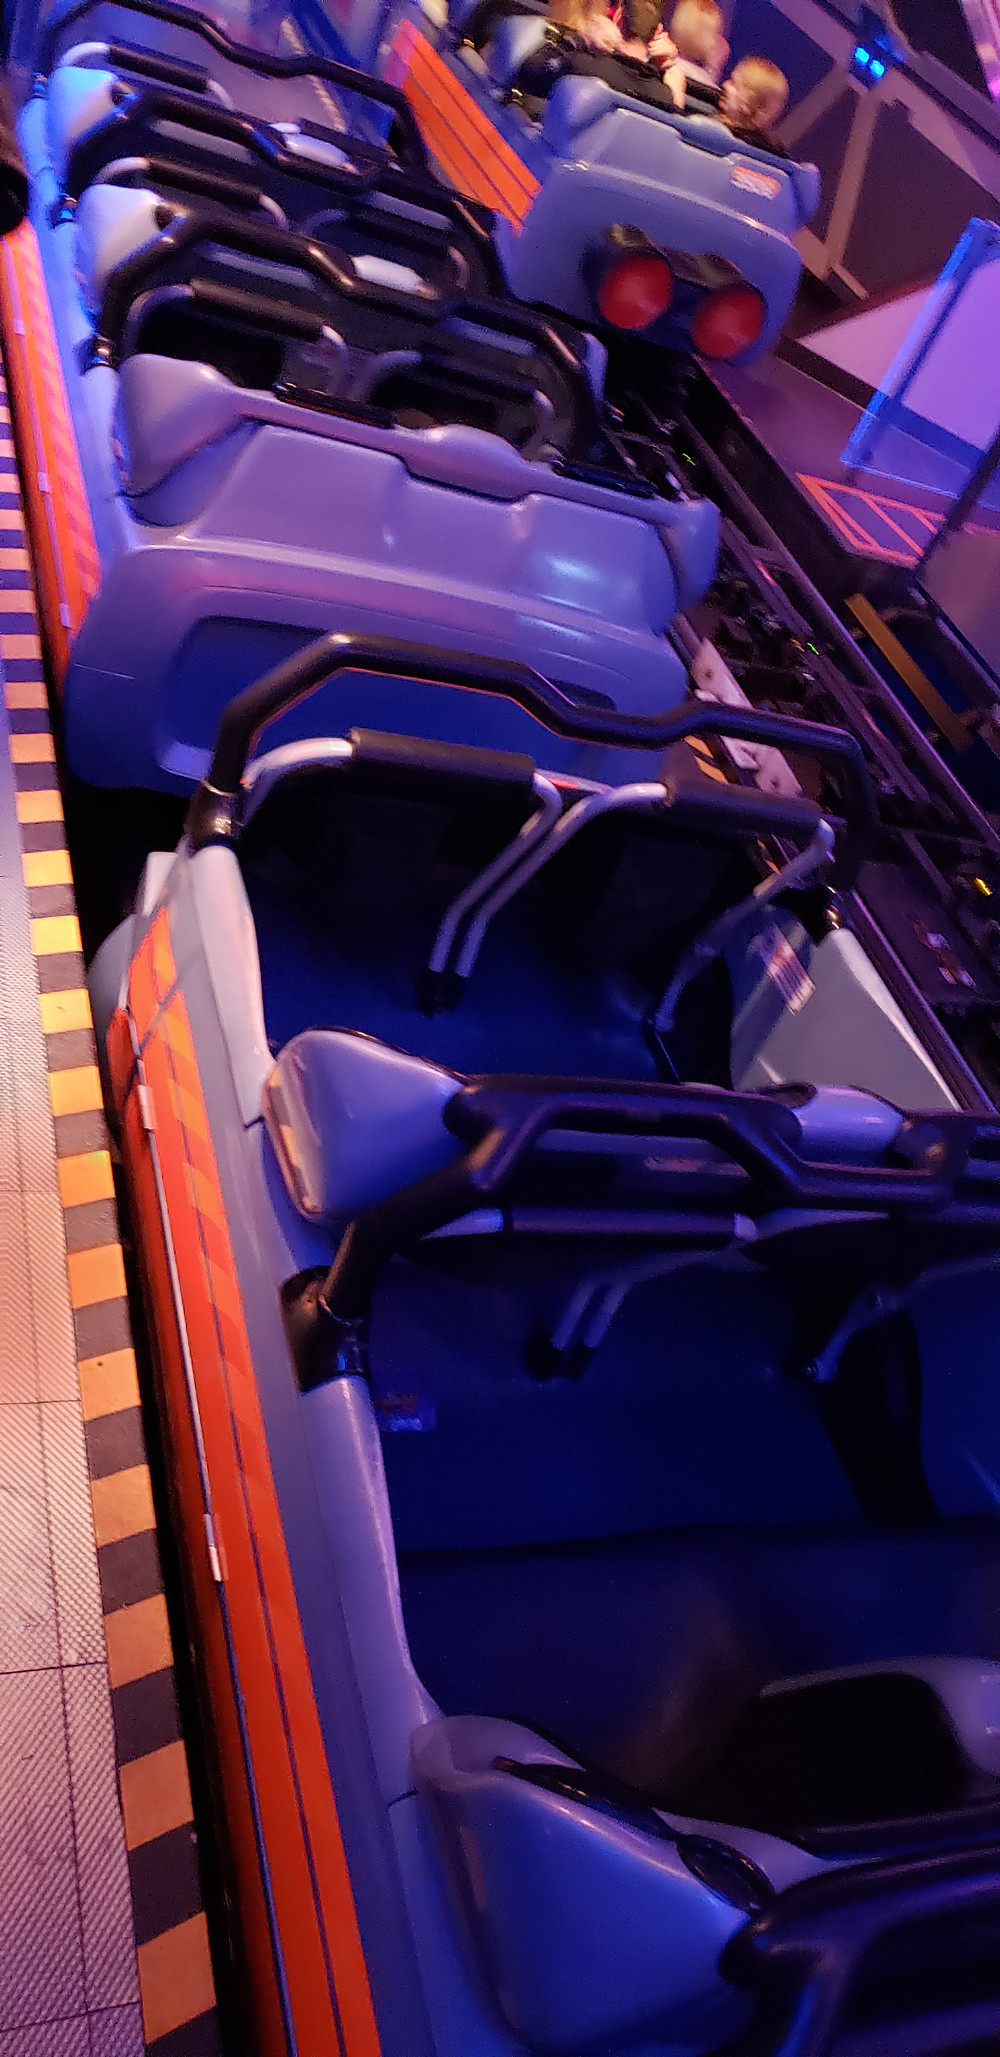 Empty rollercoaster vehicle